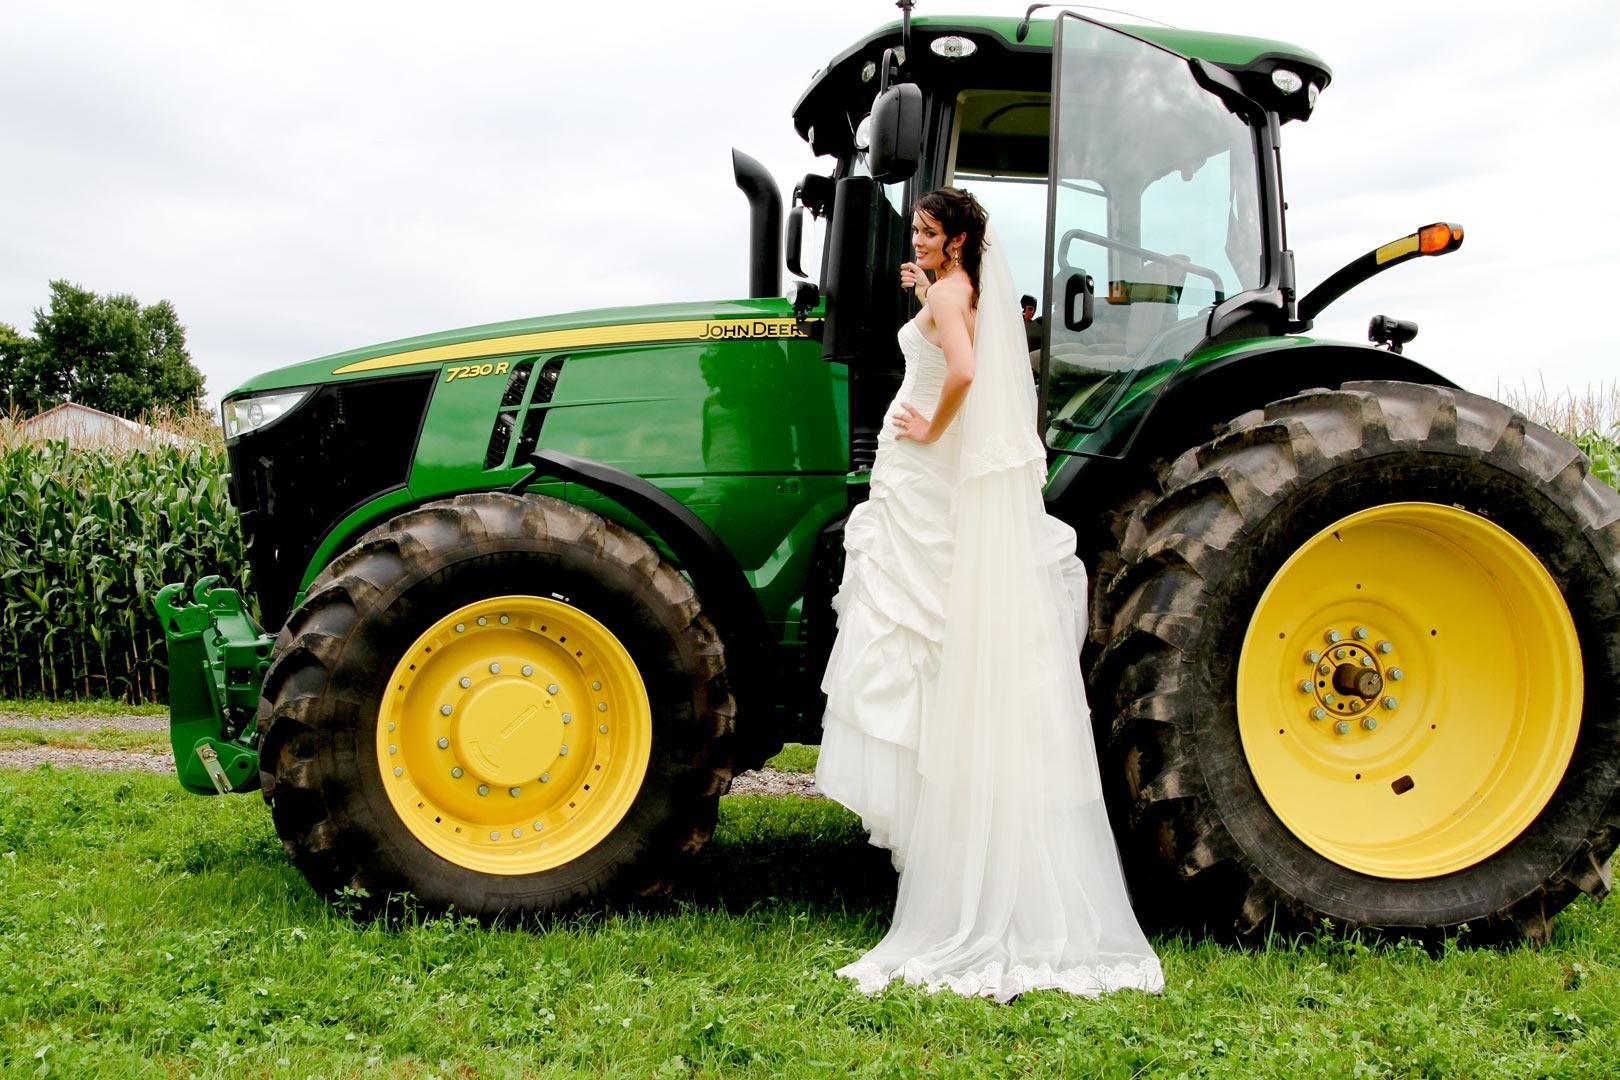 mariage-rustique-natercia-photogrpahe